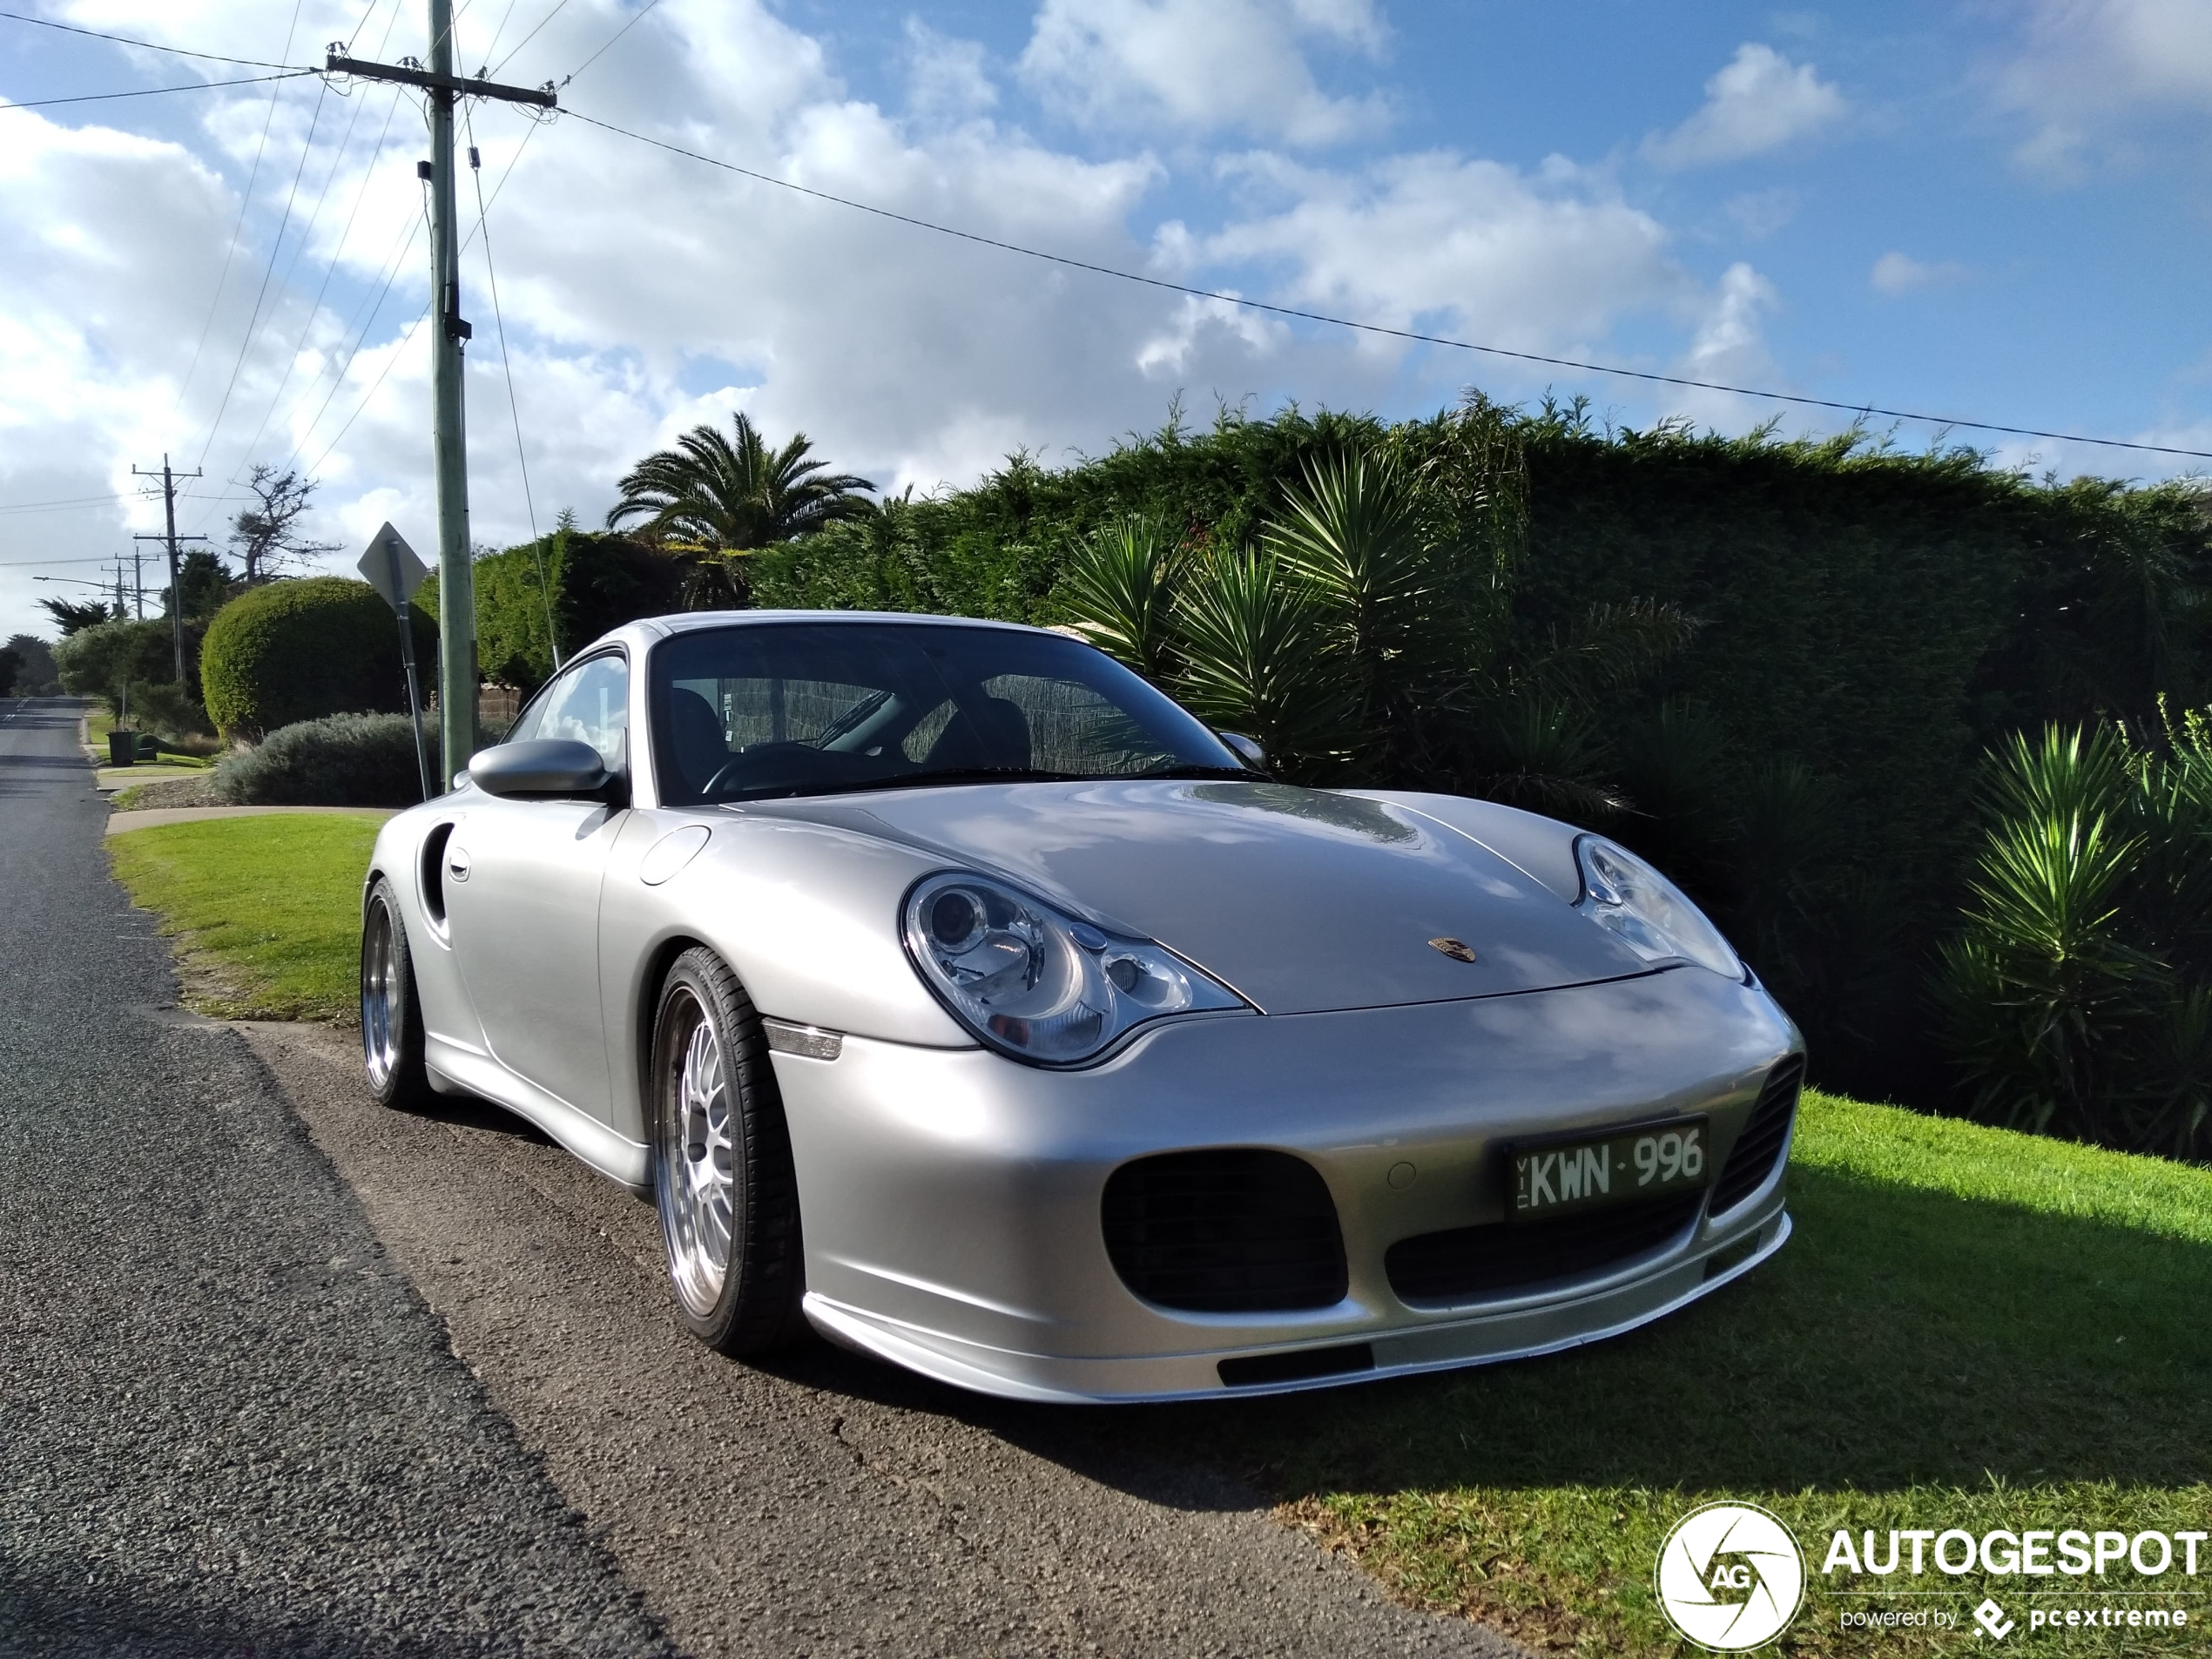 Porsche996 Turbo